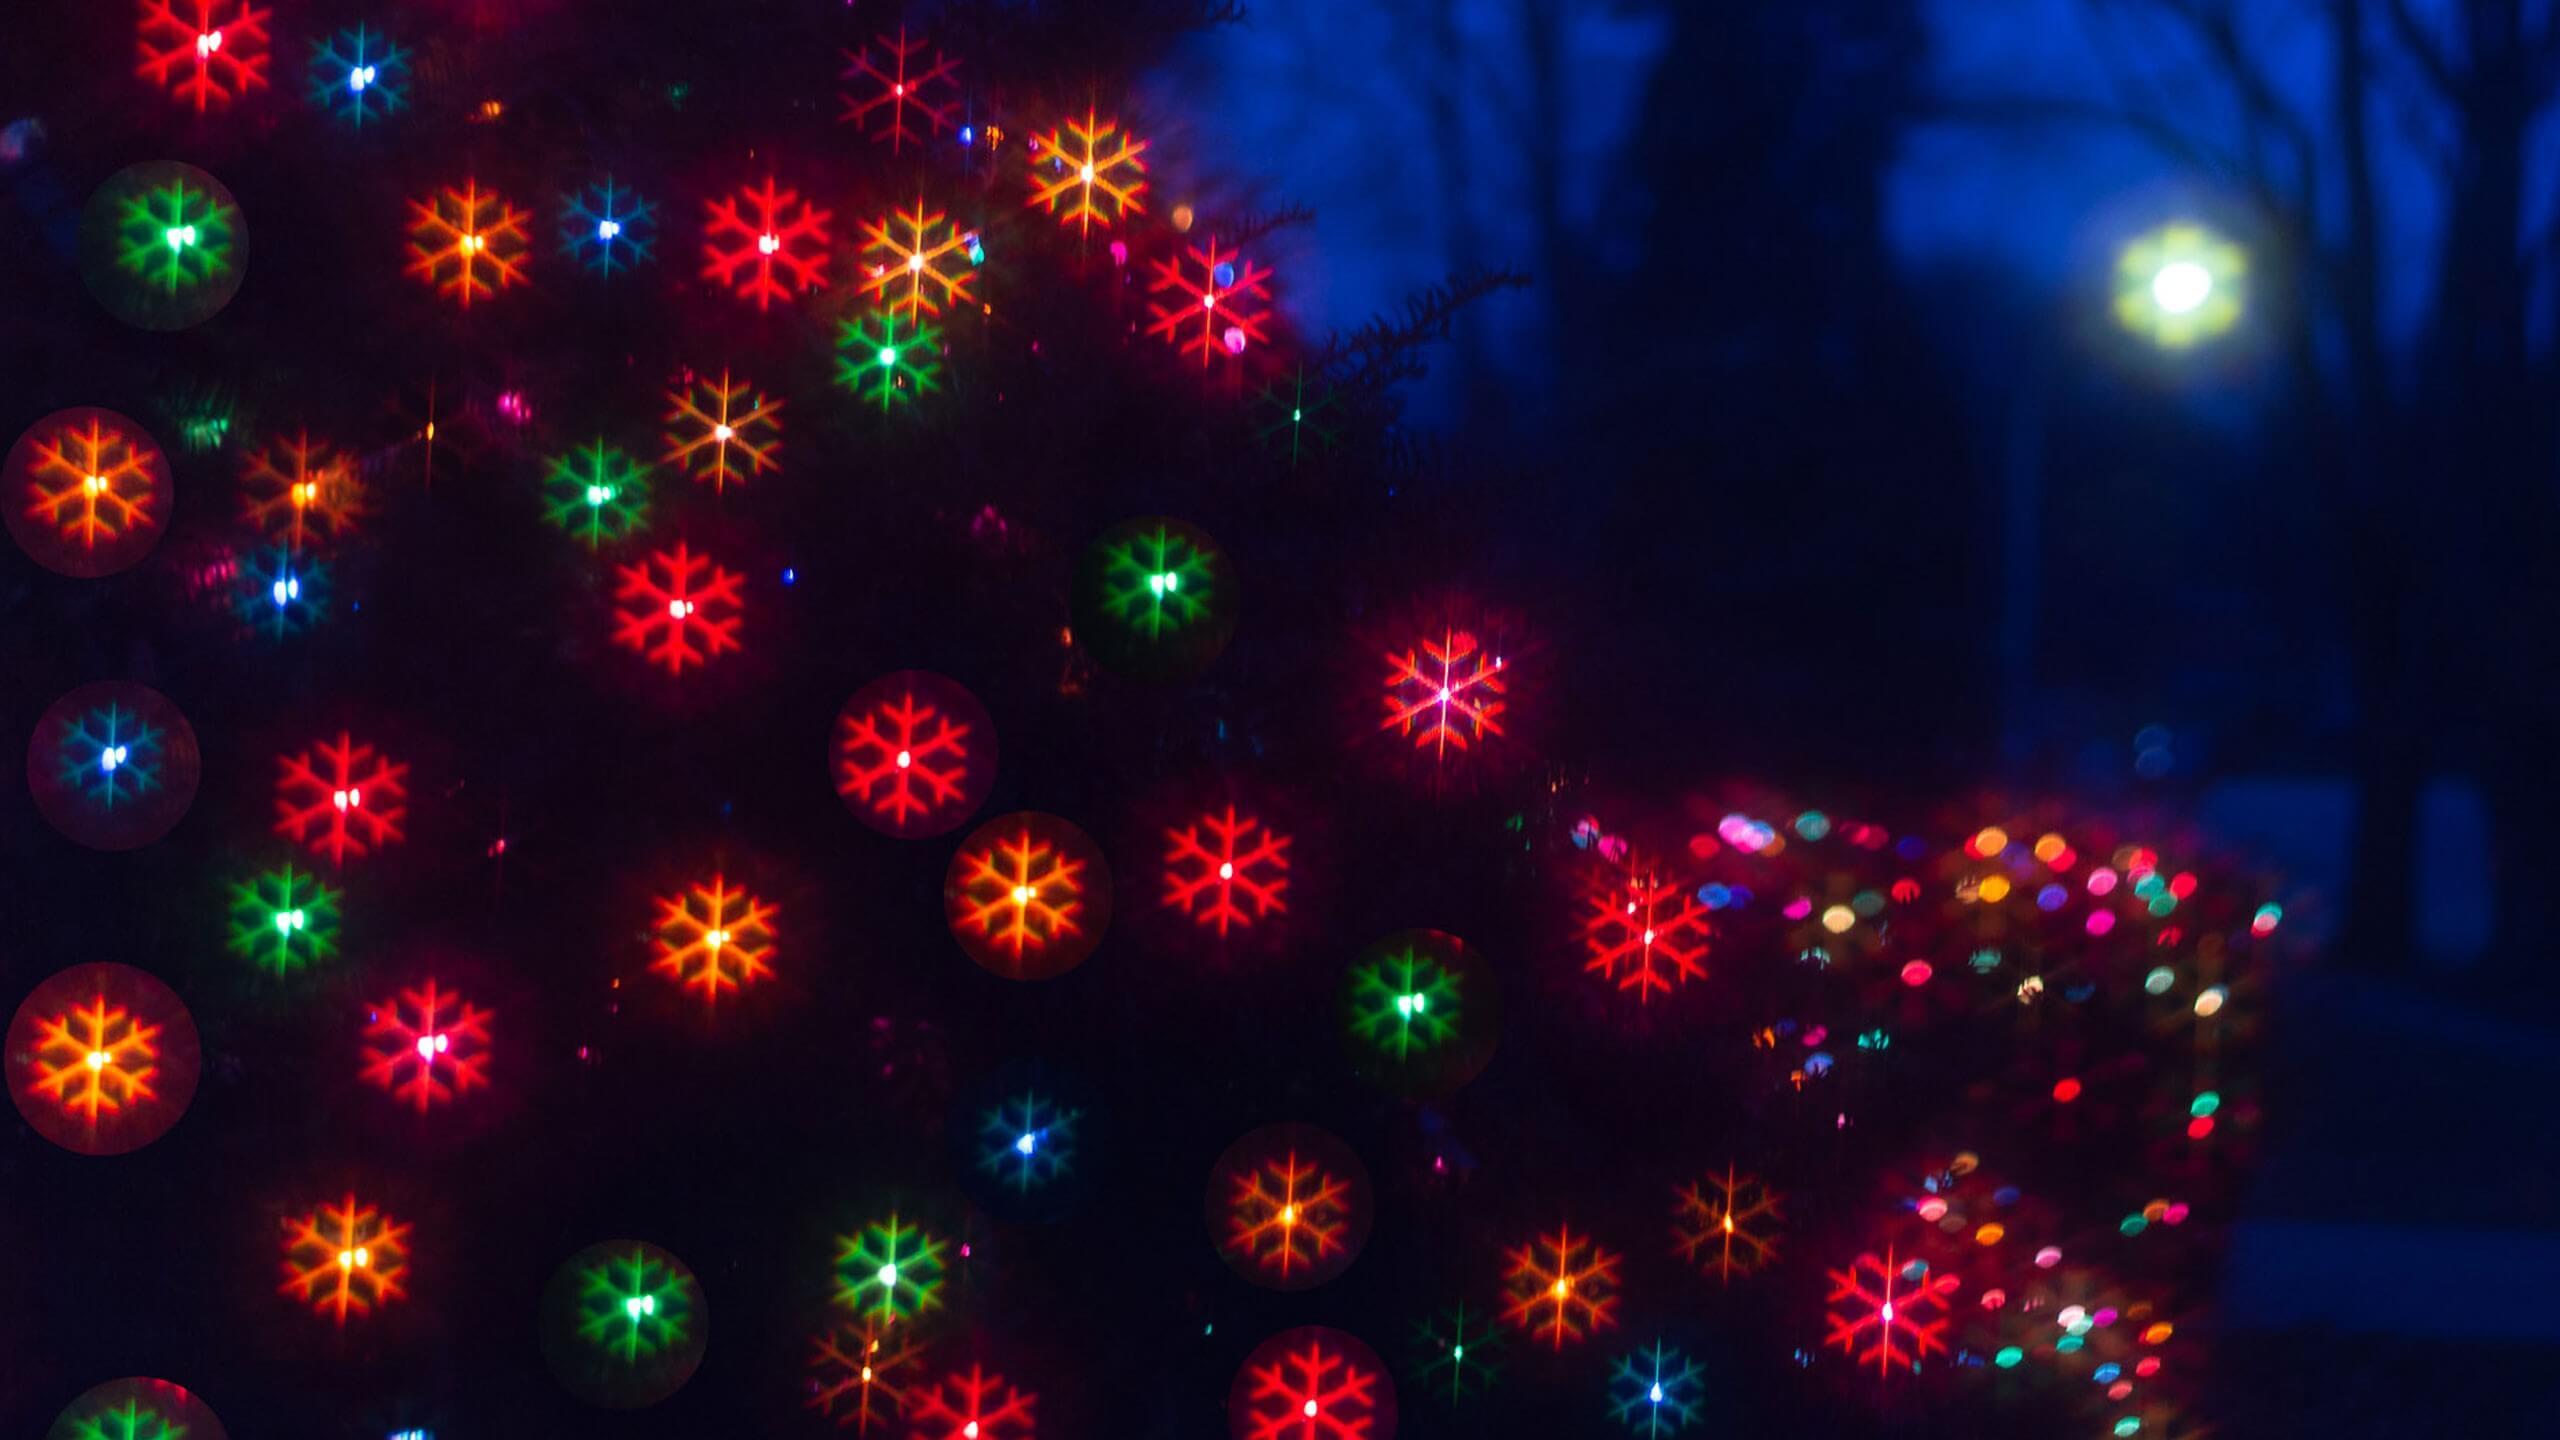 Getting creative with holiday light photos | Photofocus